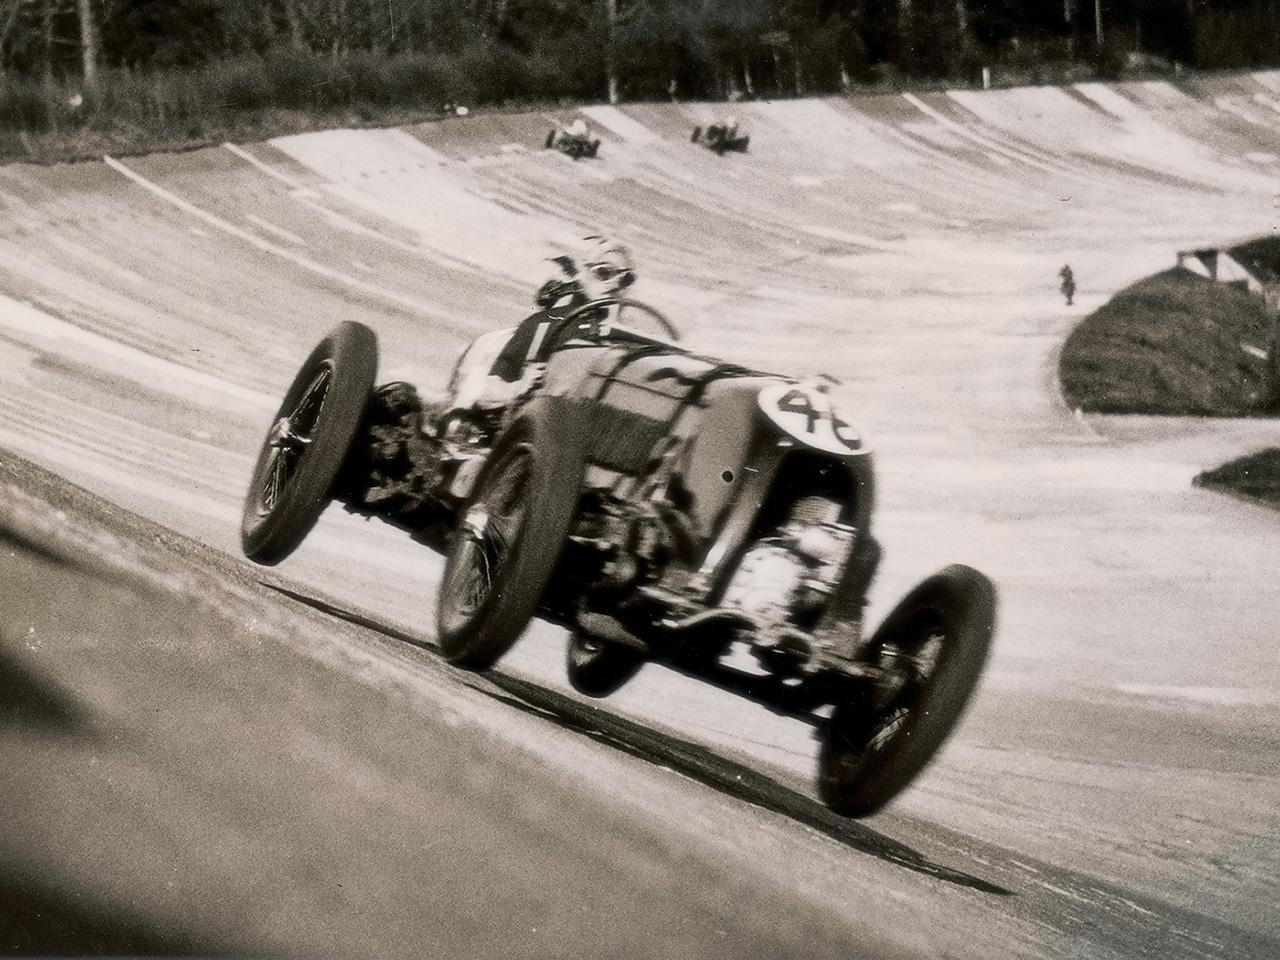 Brooklands Motor Racing Circuit